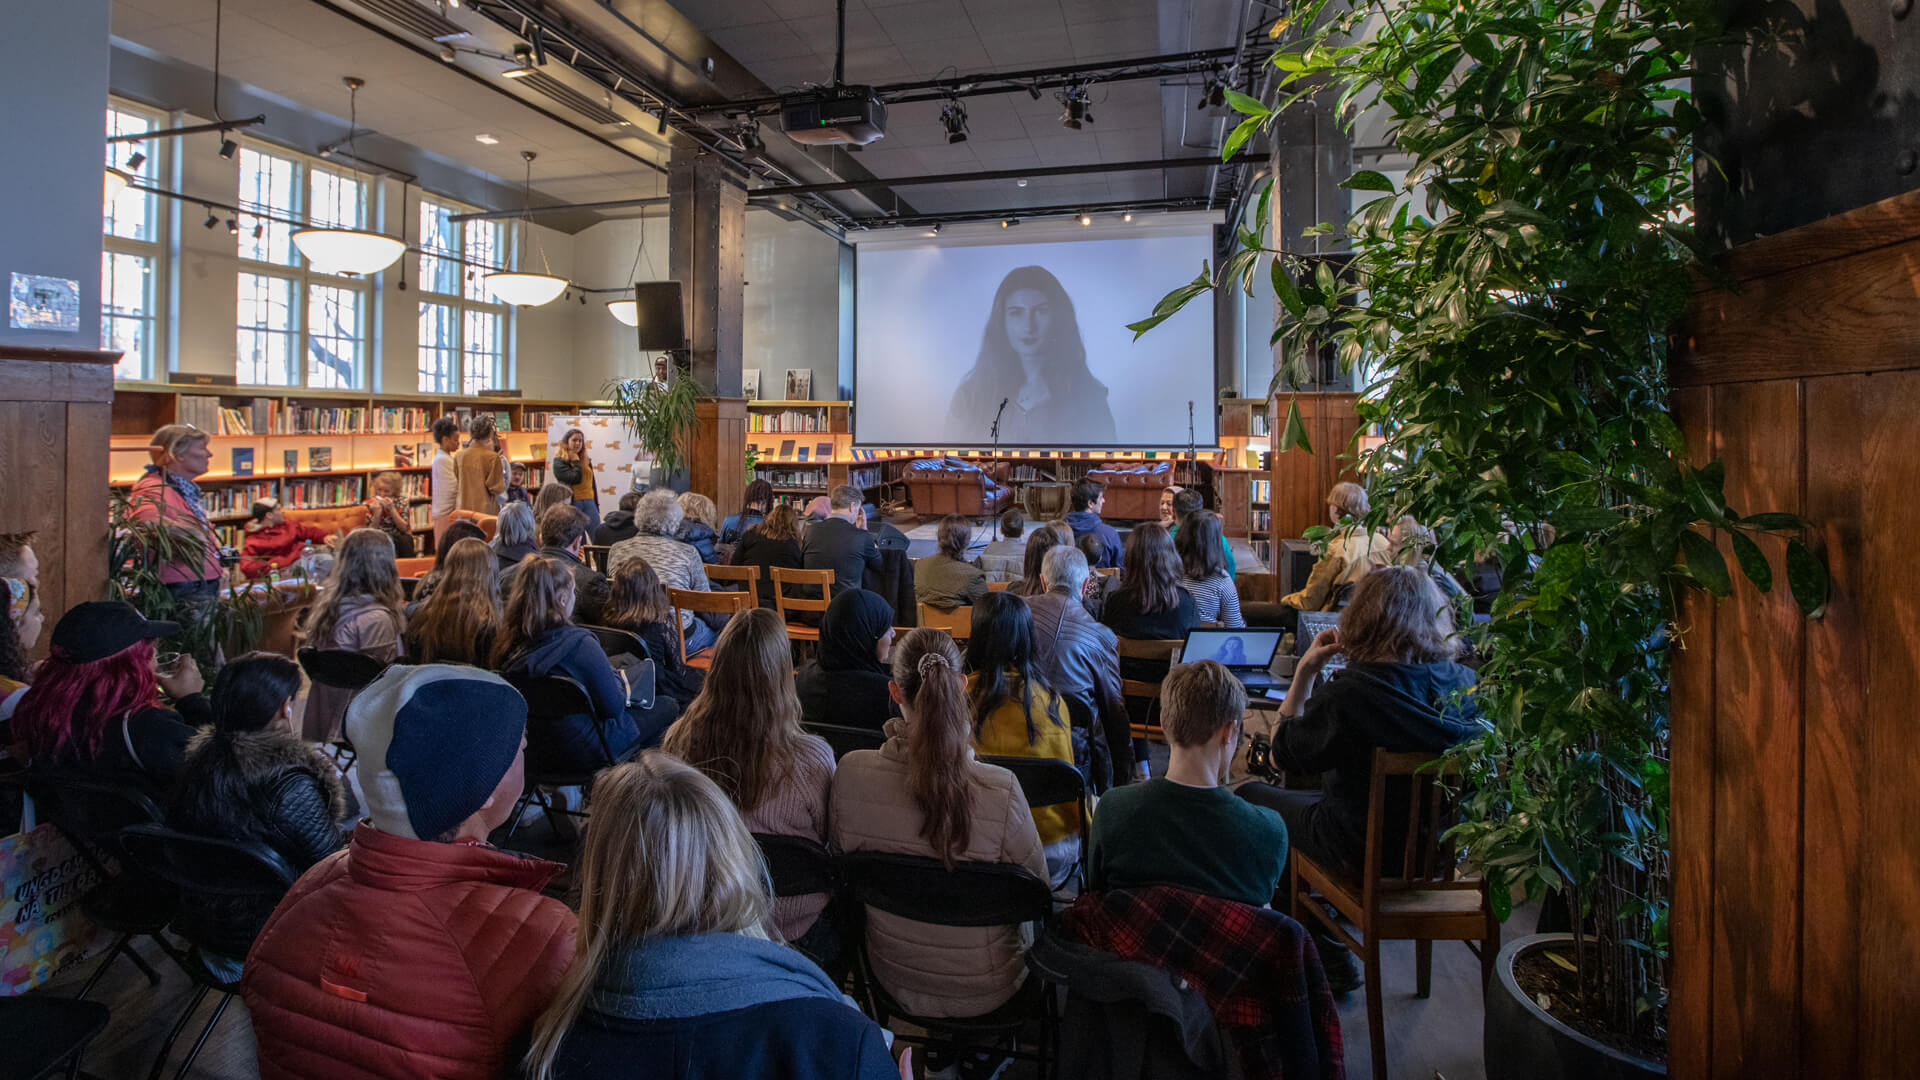 Event at Deichman Grünerløkka Library, Oslo